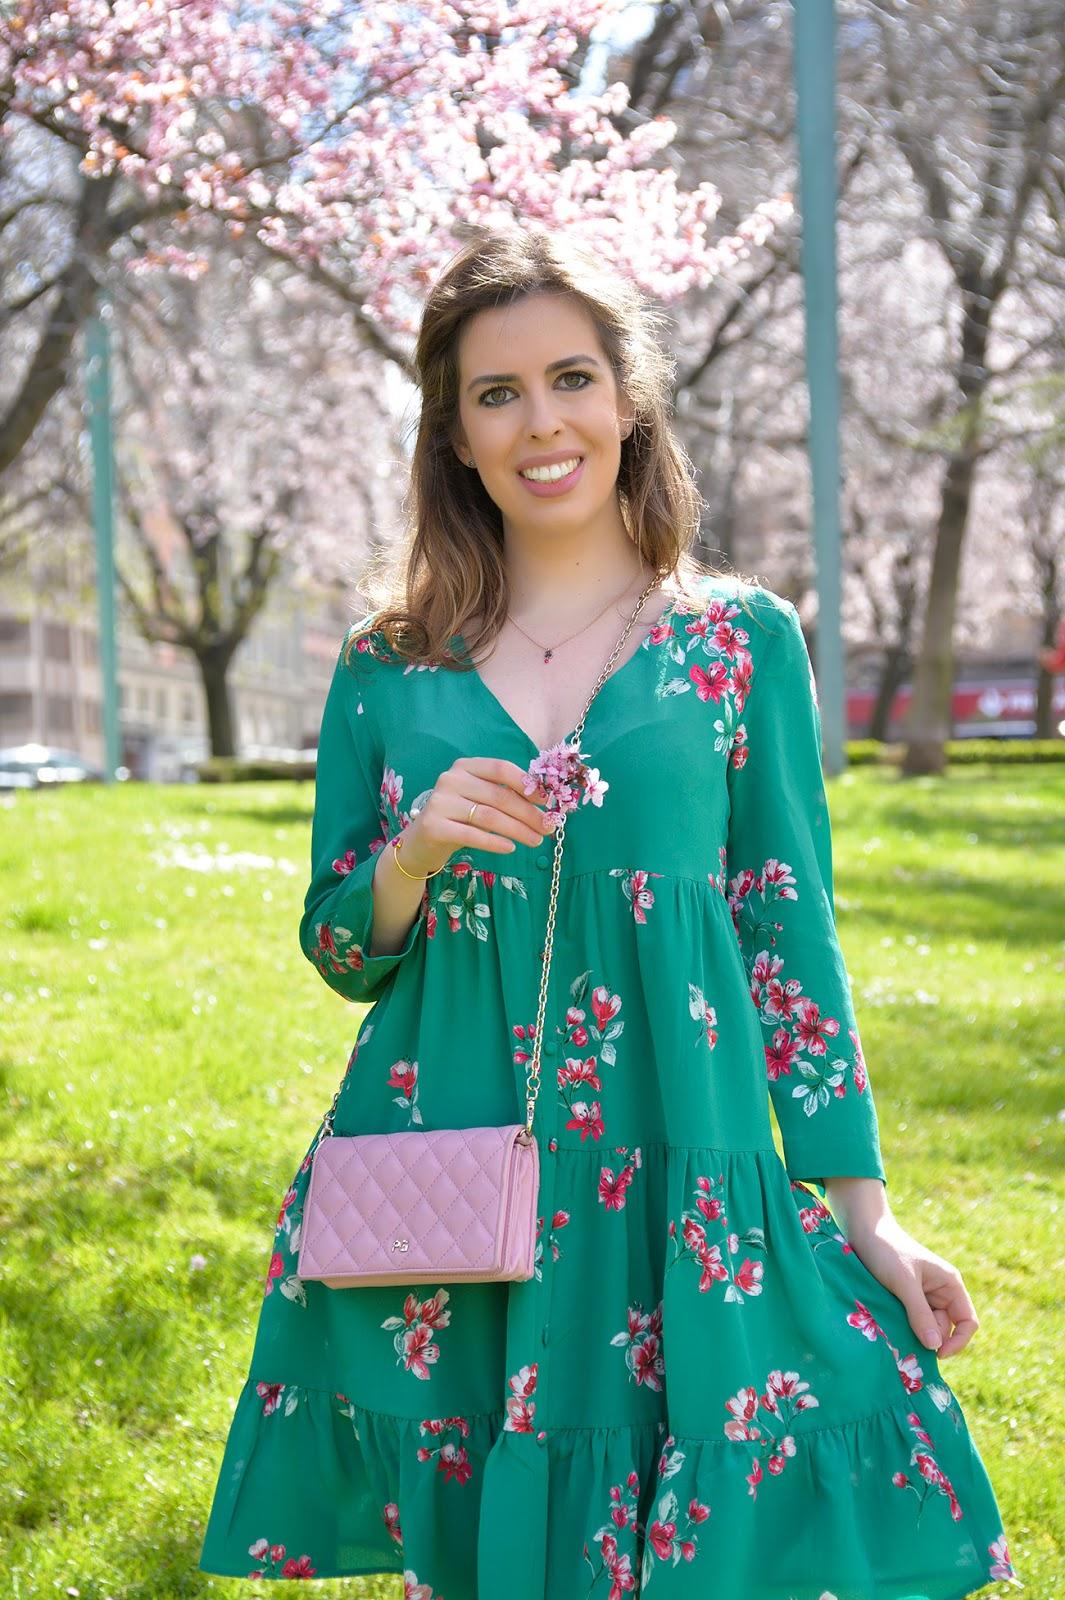 spring flower silk dress sezane travel outfit